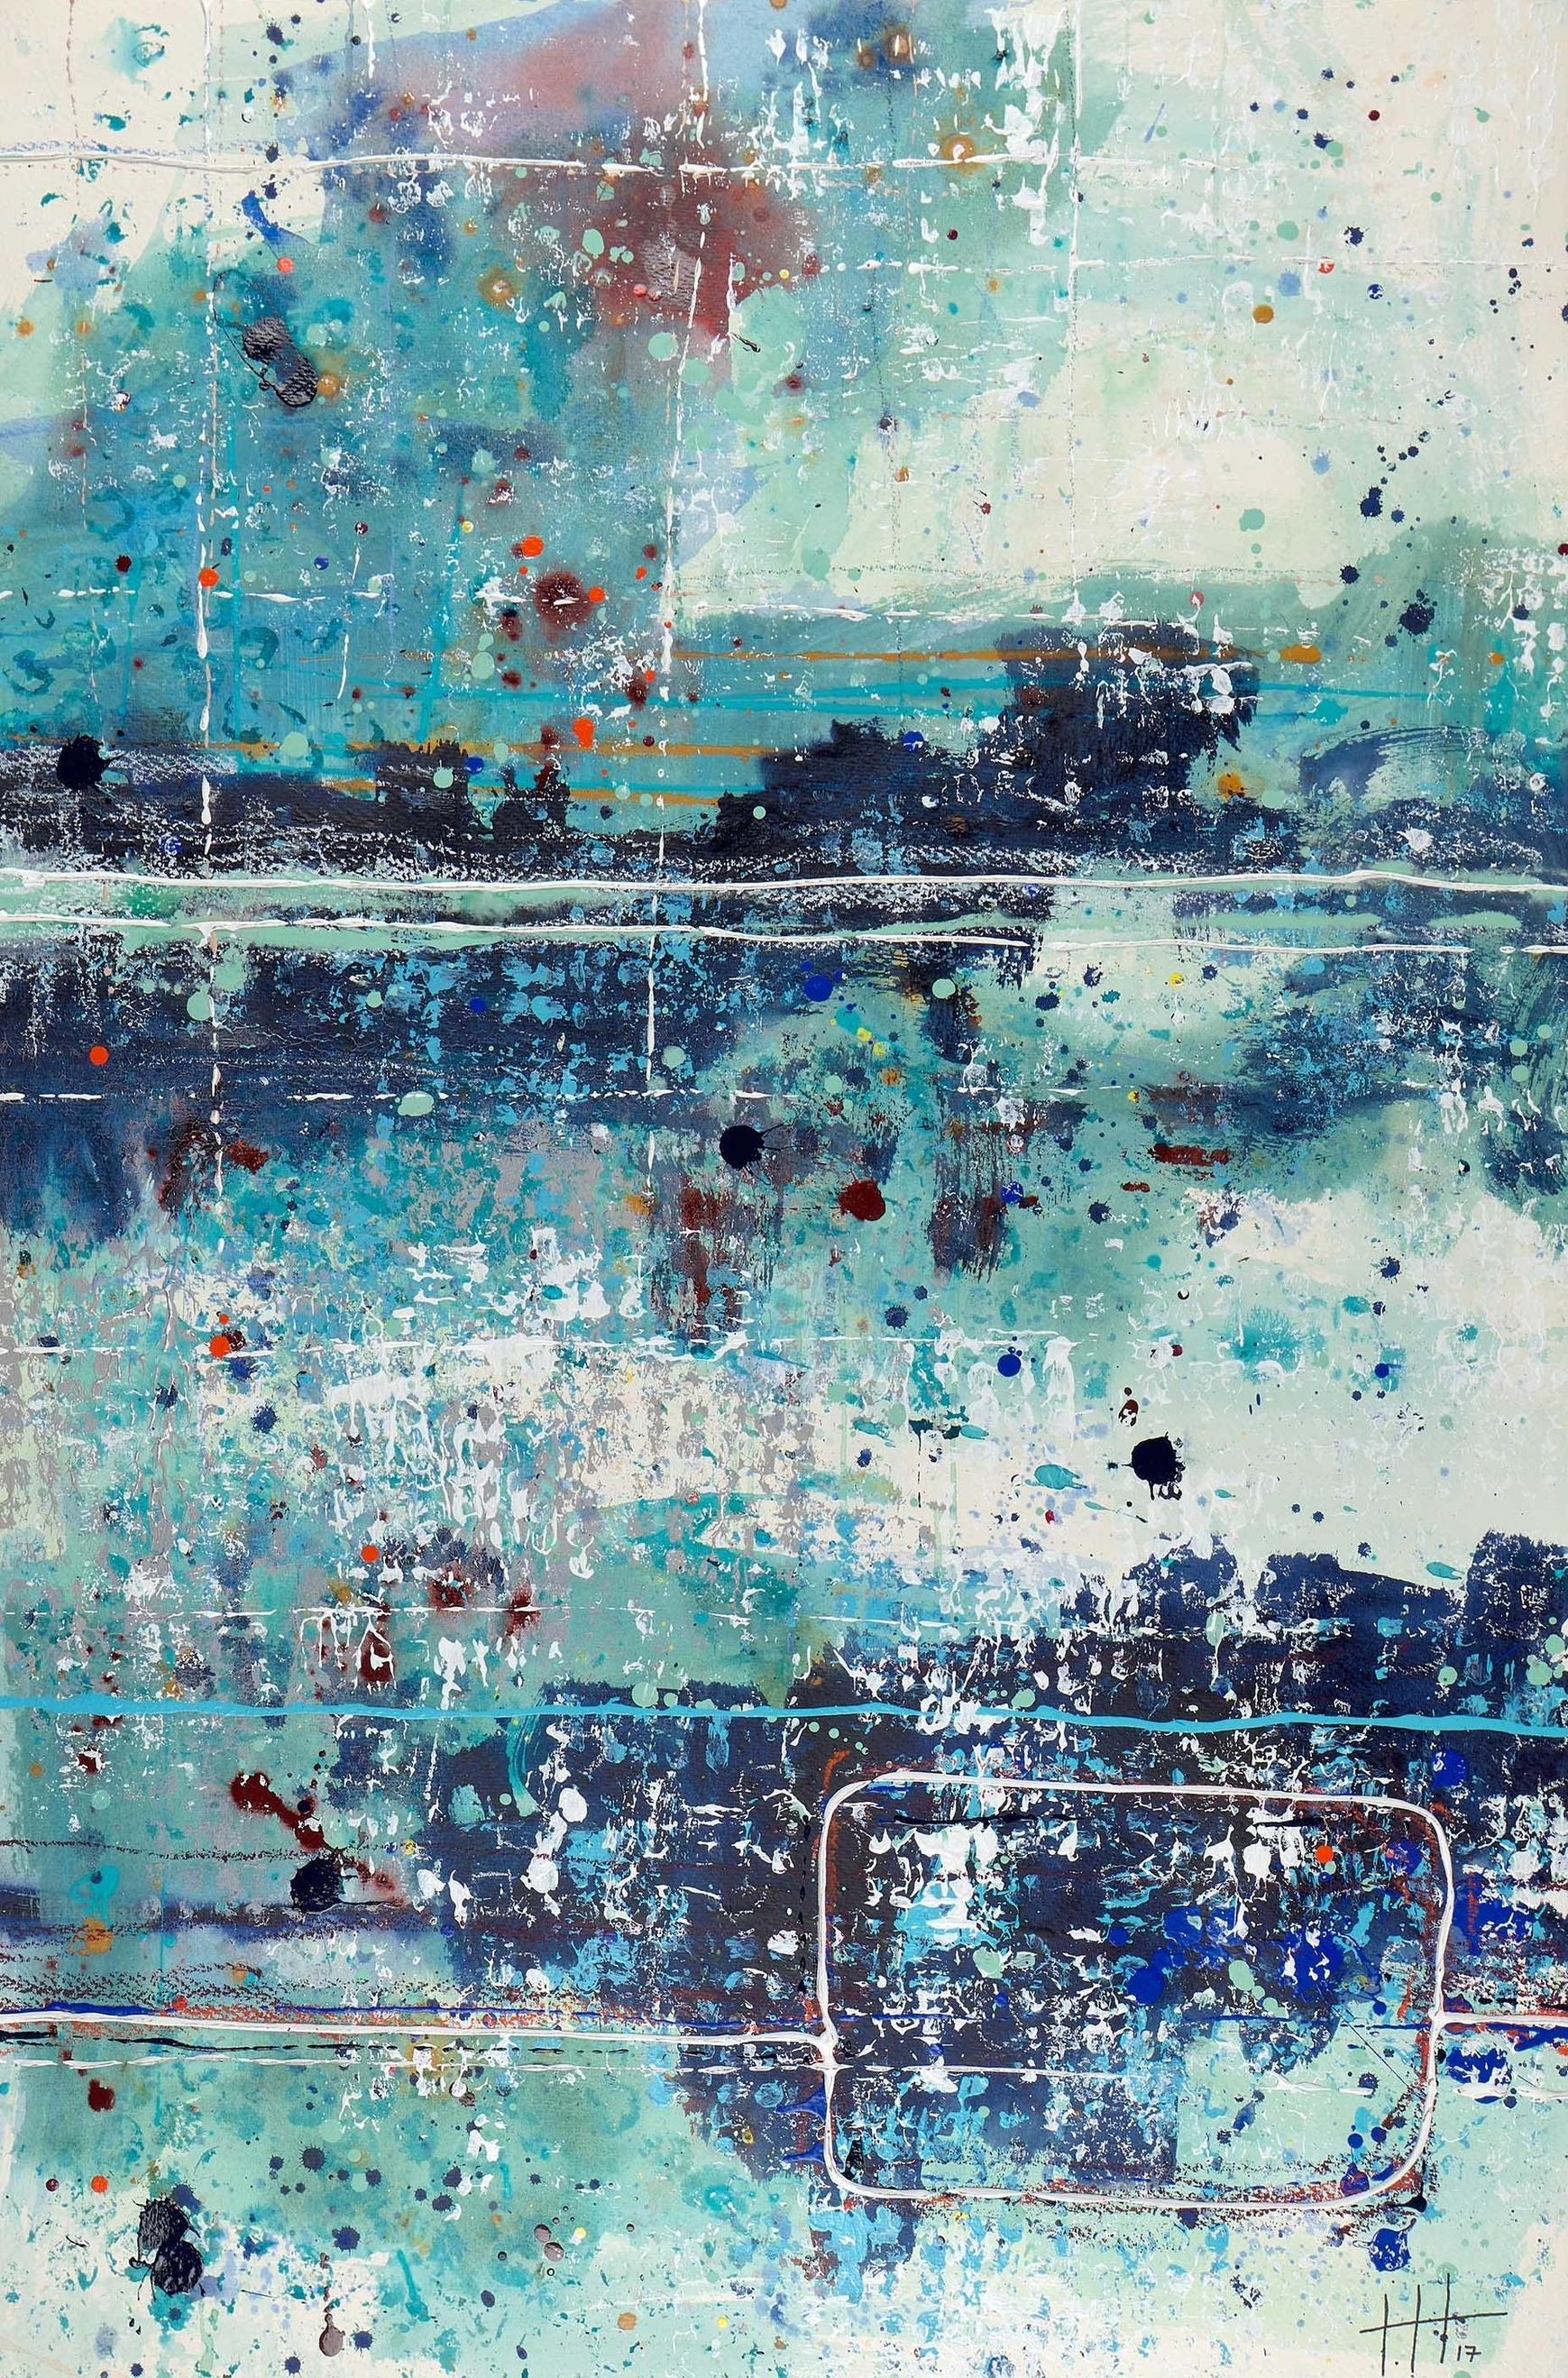 'Untitled' Acrylic & Mixed Media / 55cm x 55cm (framed) SOLD